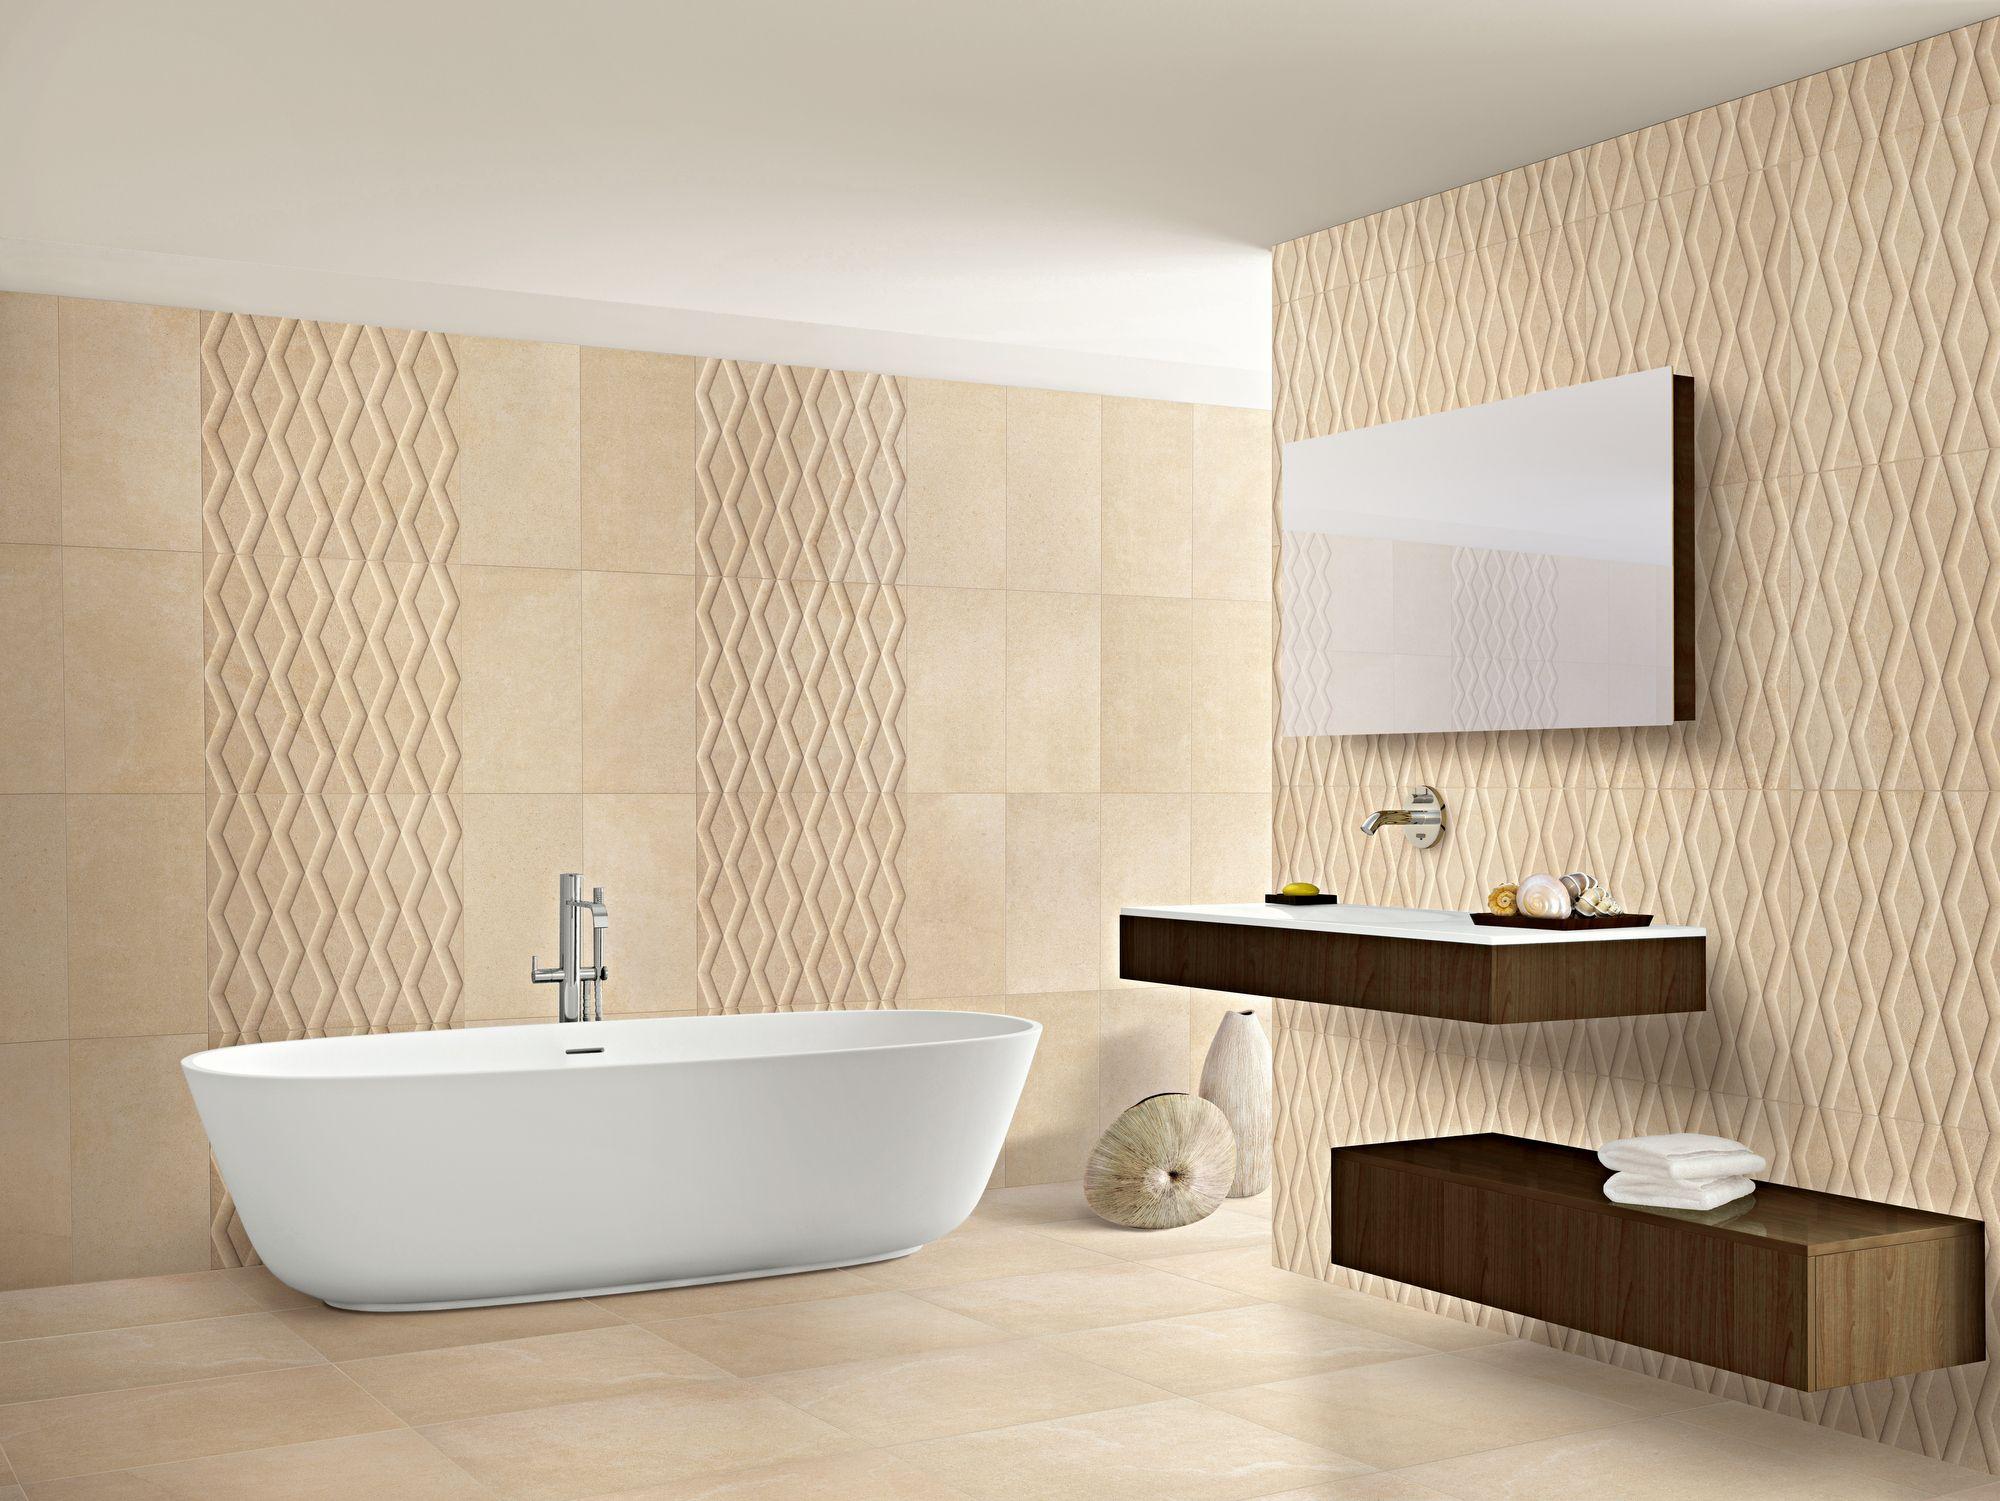 timeless stone wall tiles by ceramica cercom. Black Bedroom Furniture Sets. Home Design Ideas